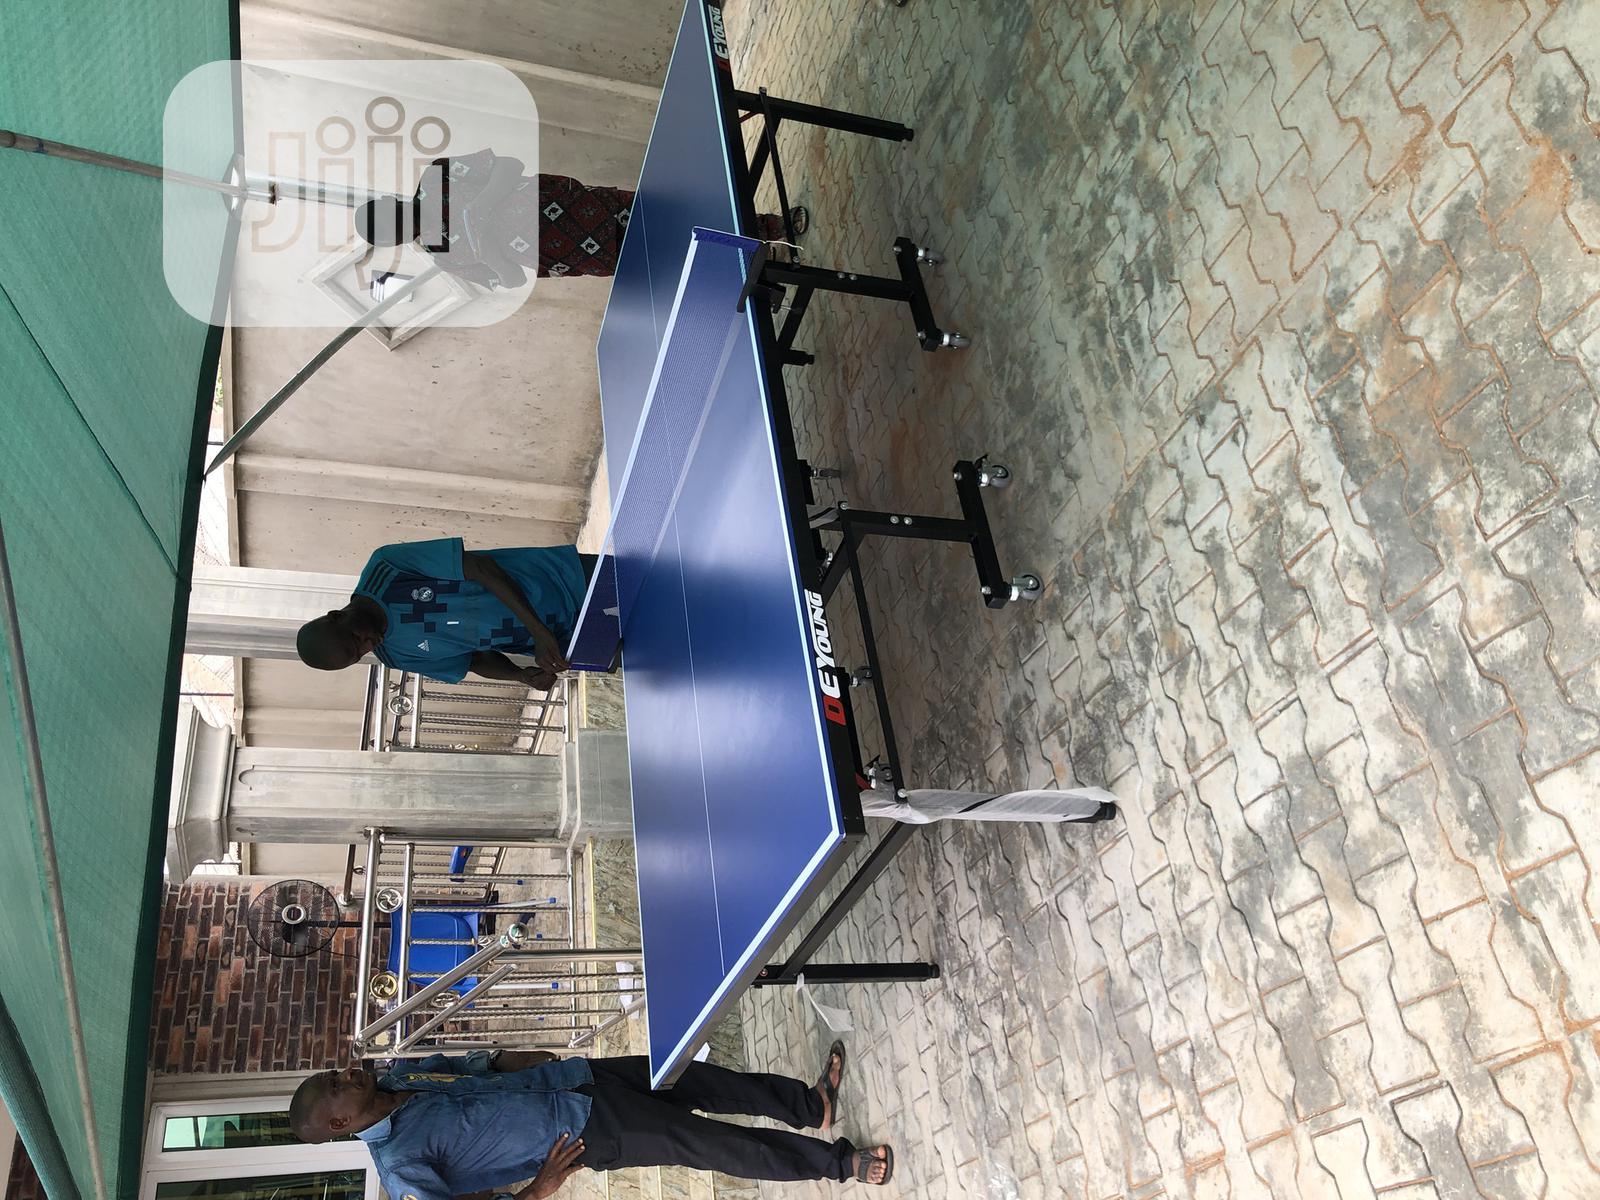 Table Tennis 🏓